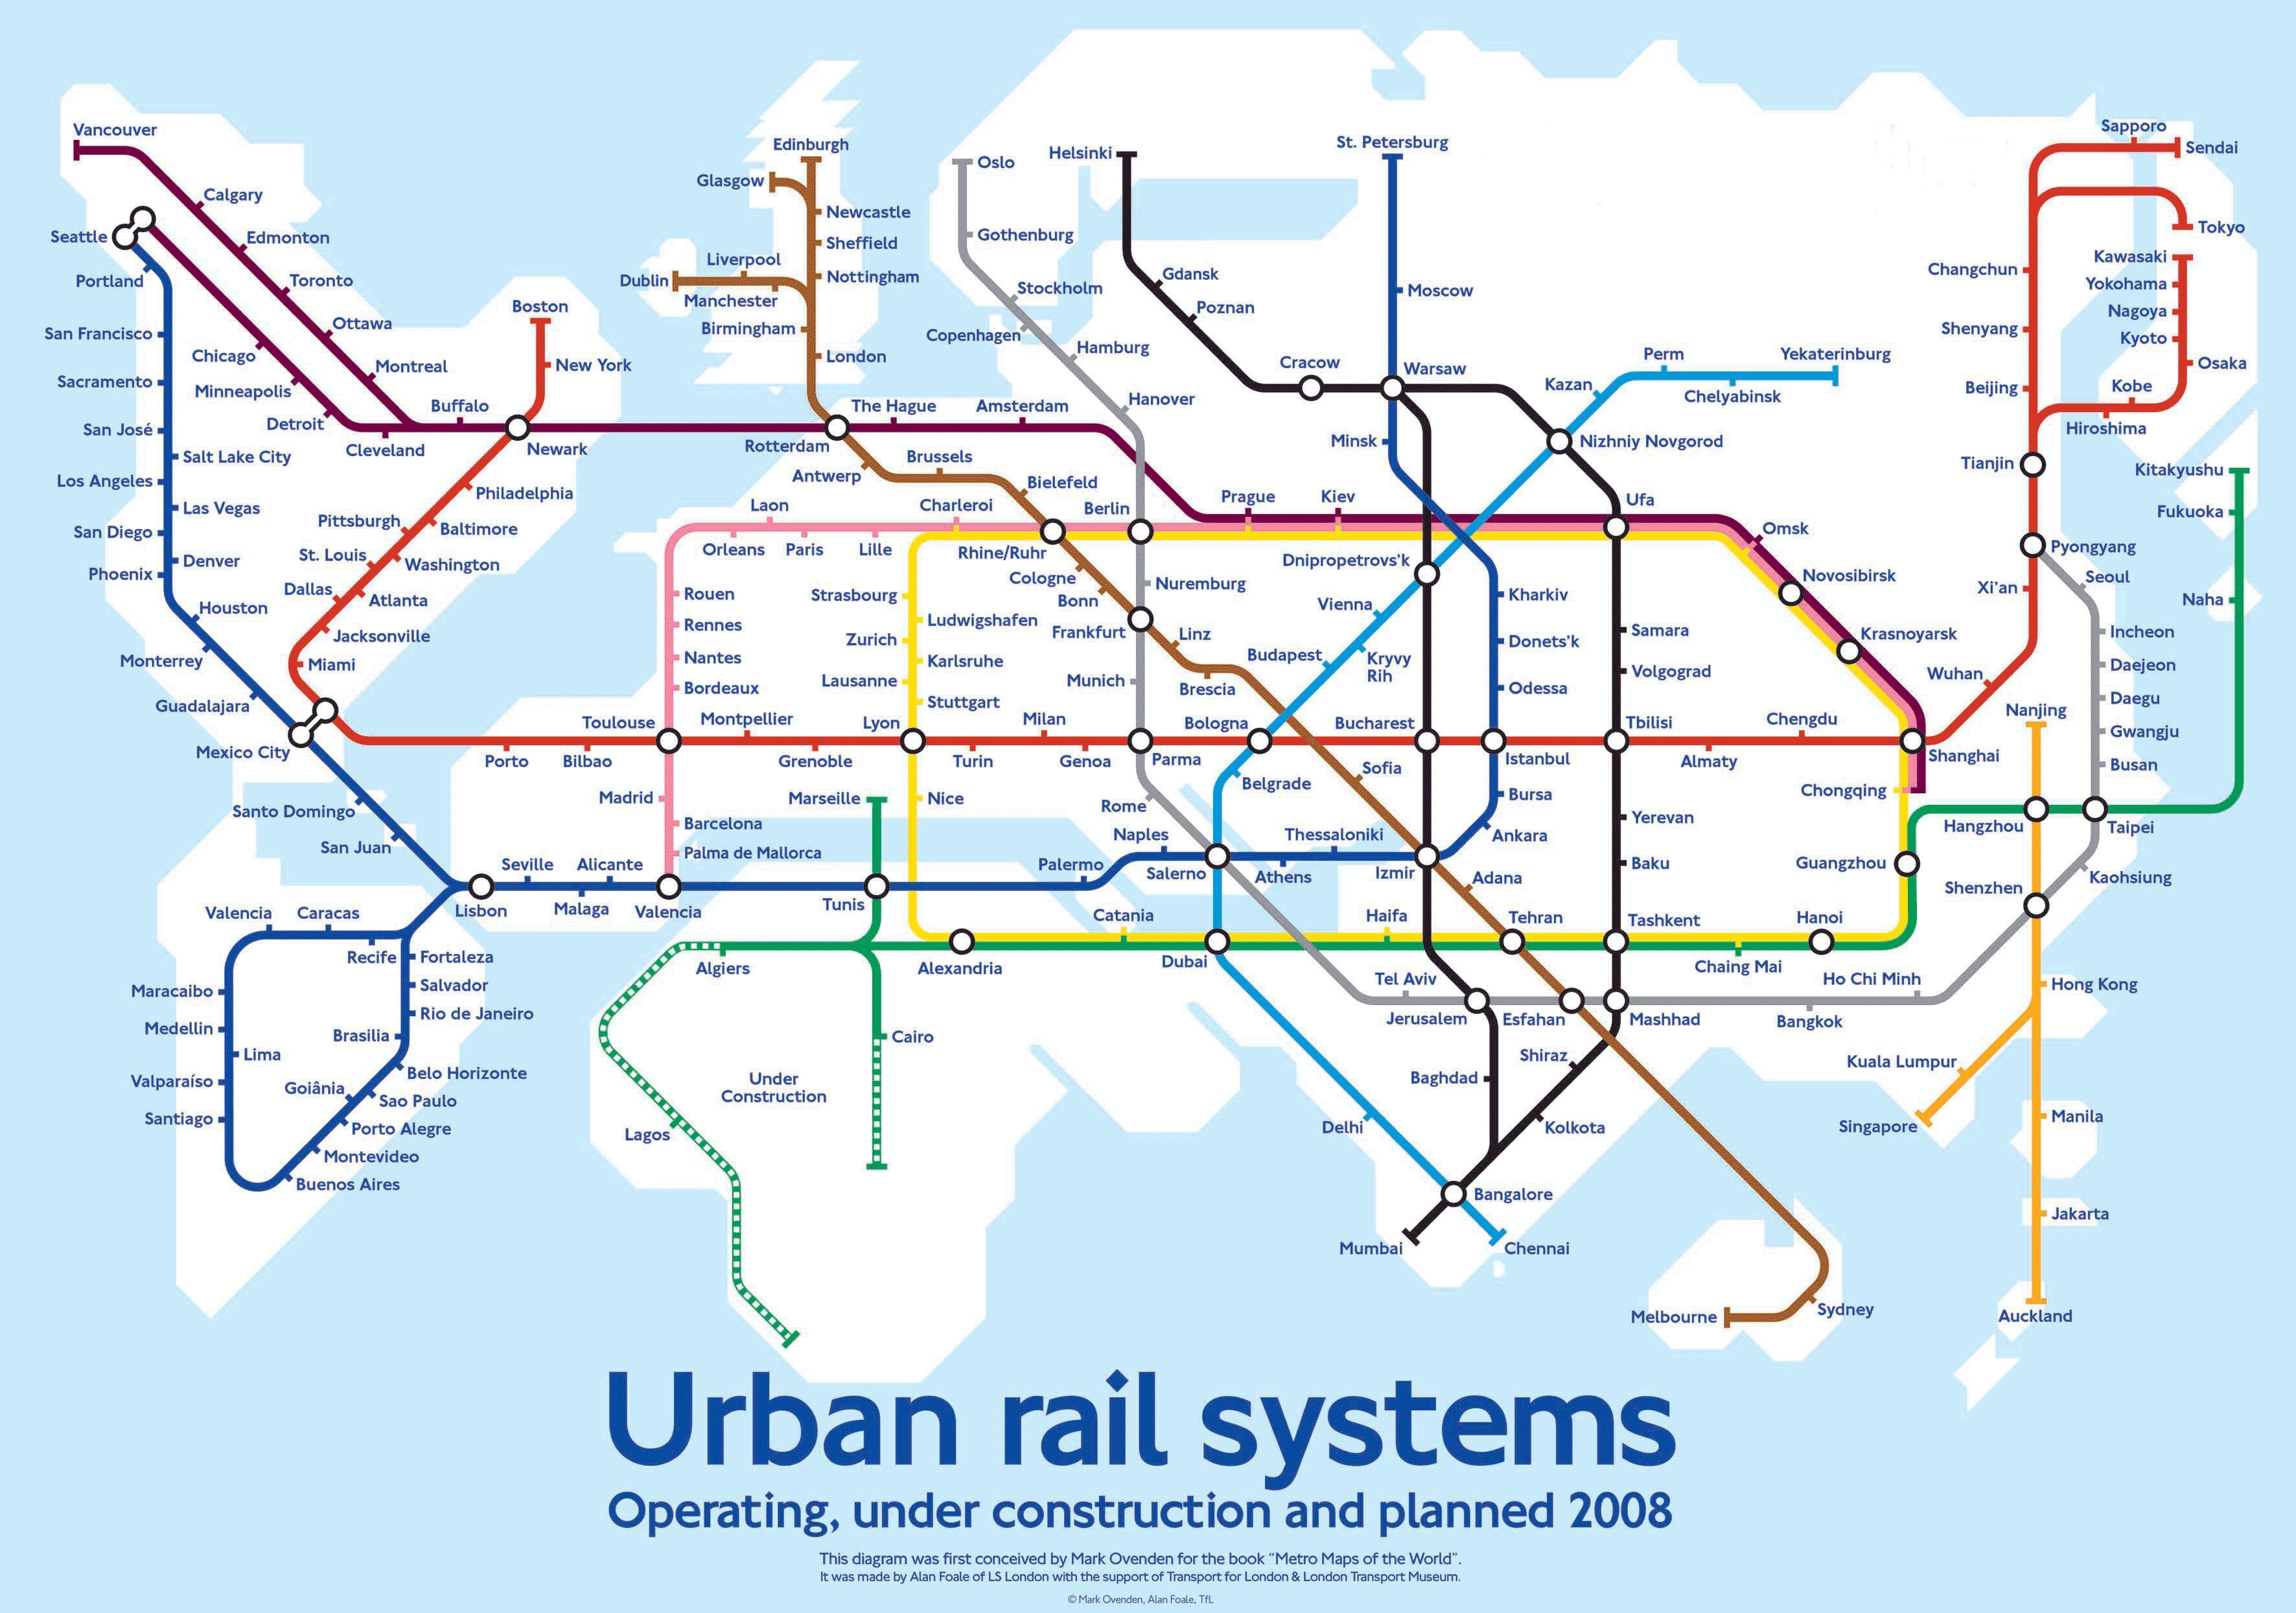 Subway Maps Of The World